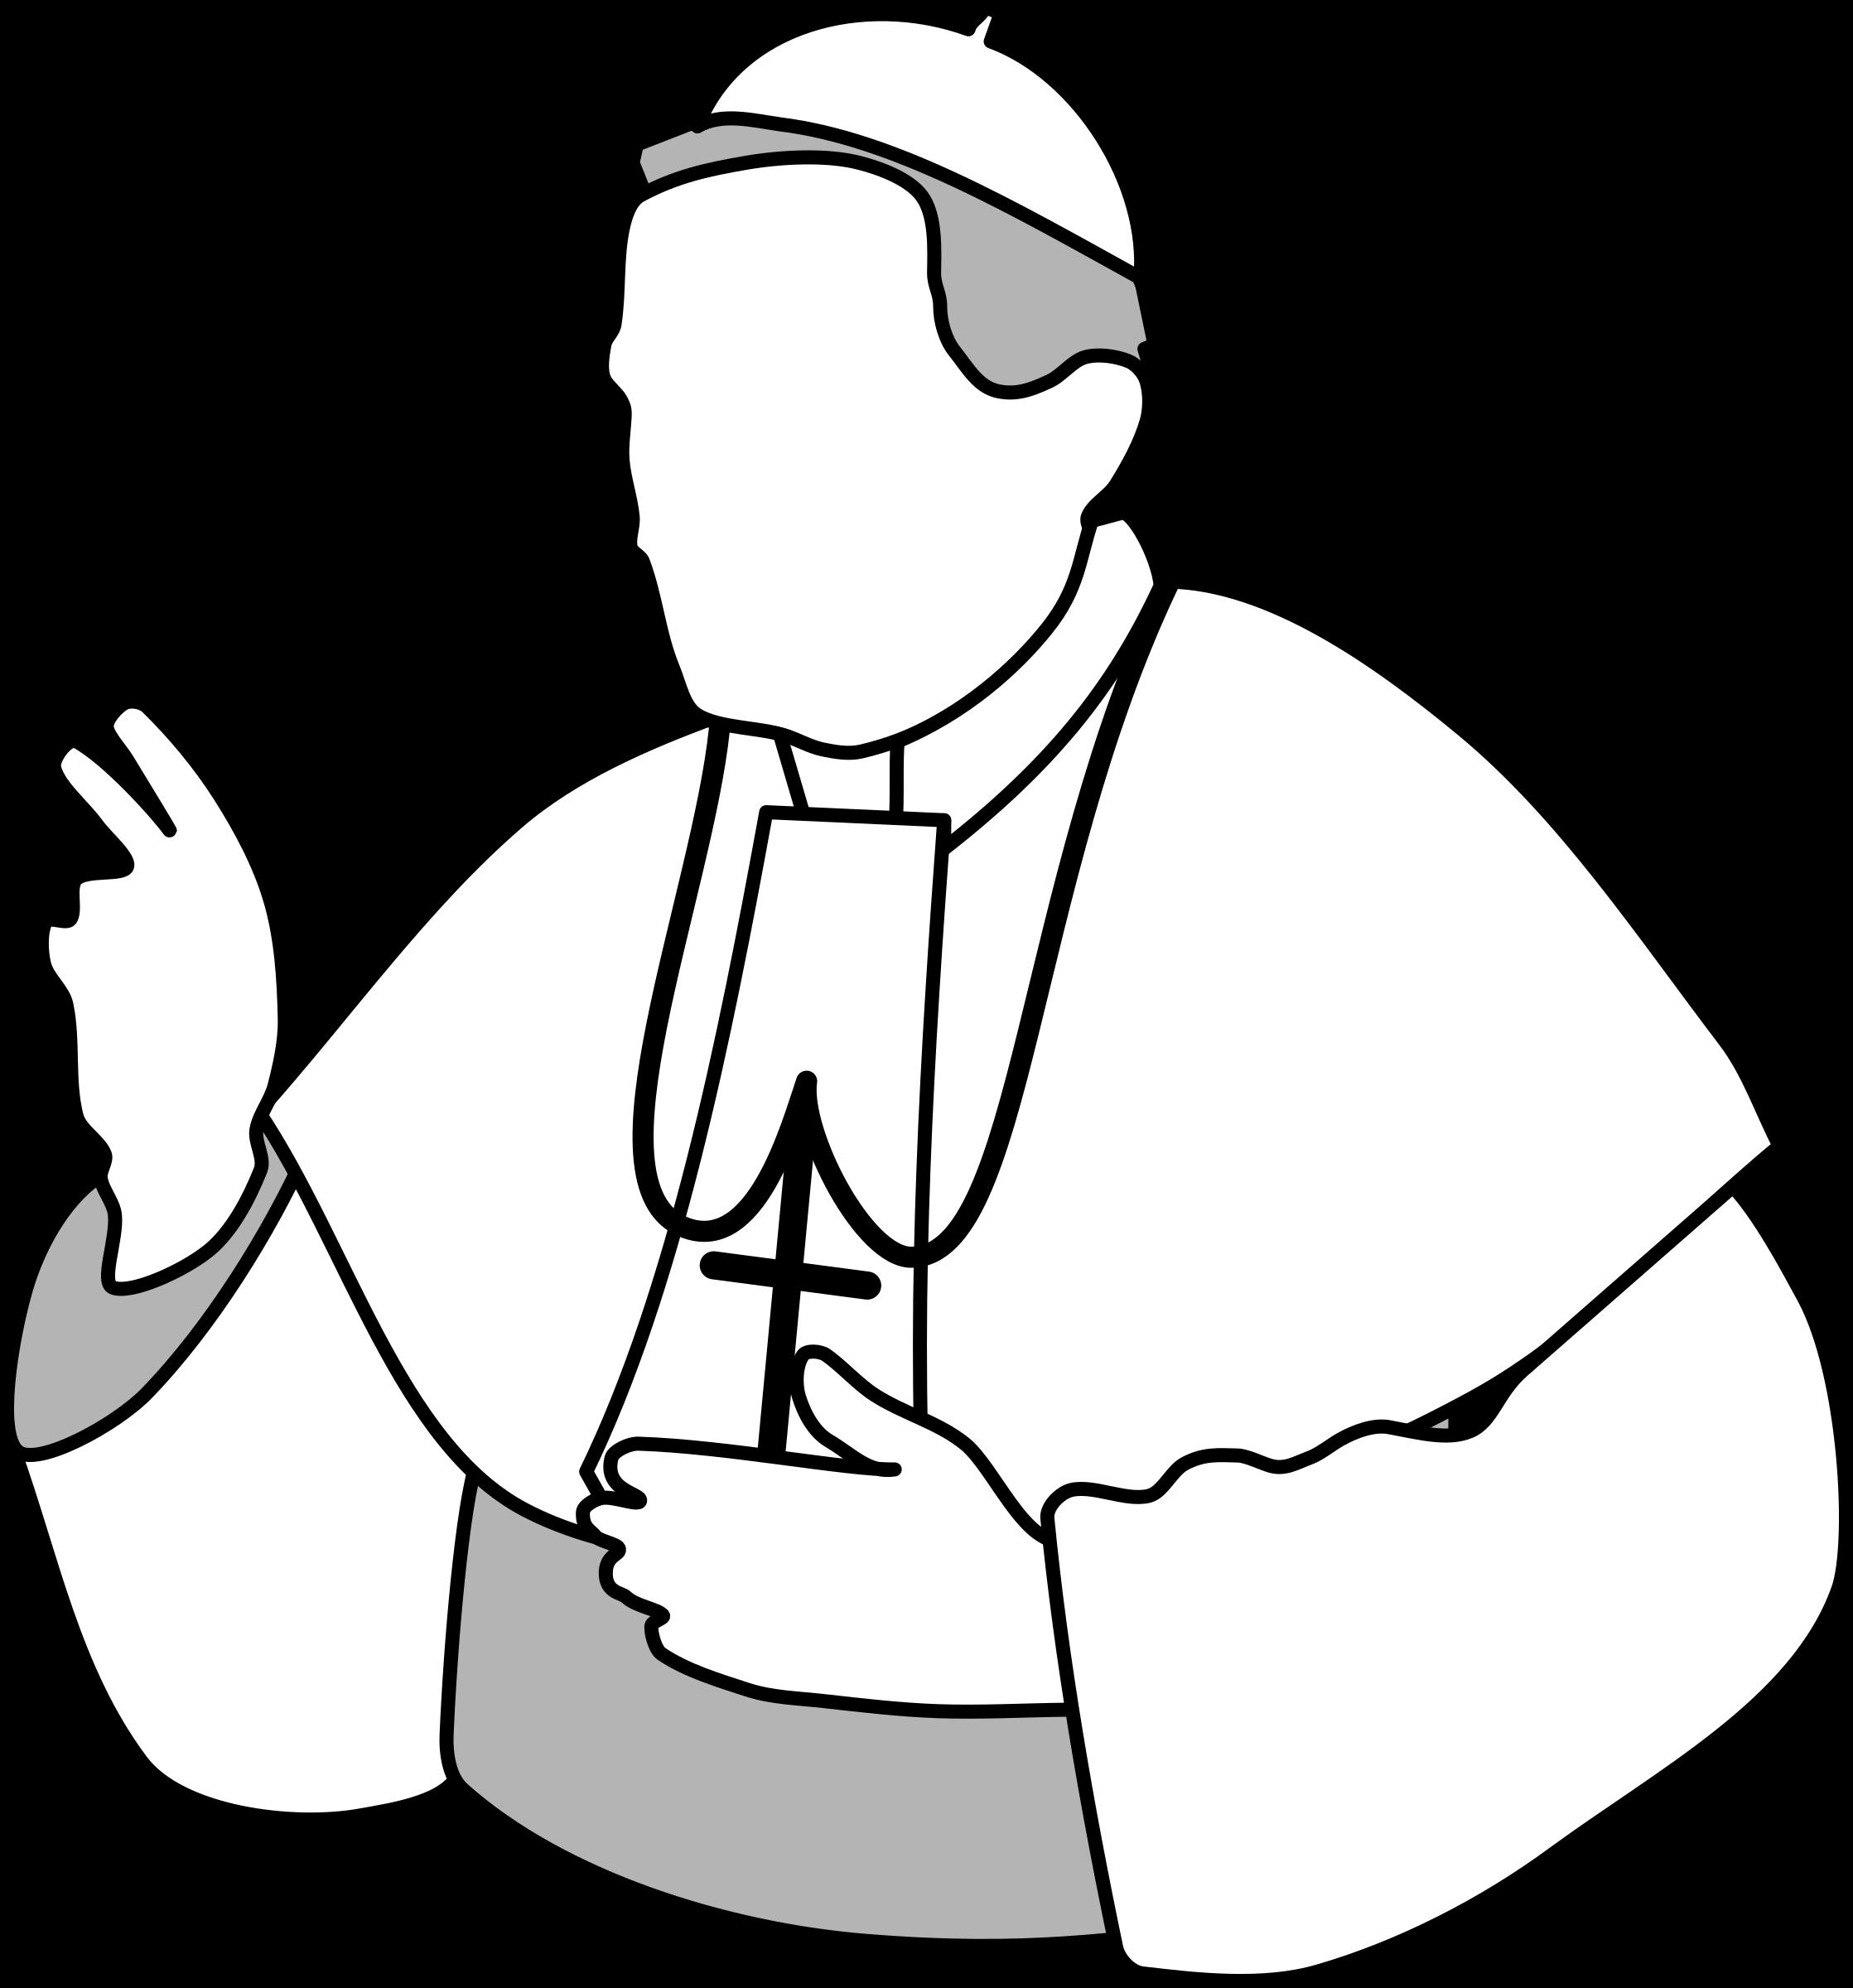 Pope big image png. Website clipart line art